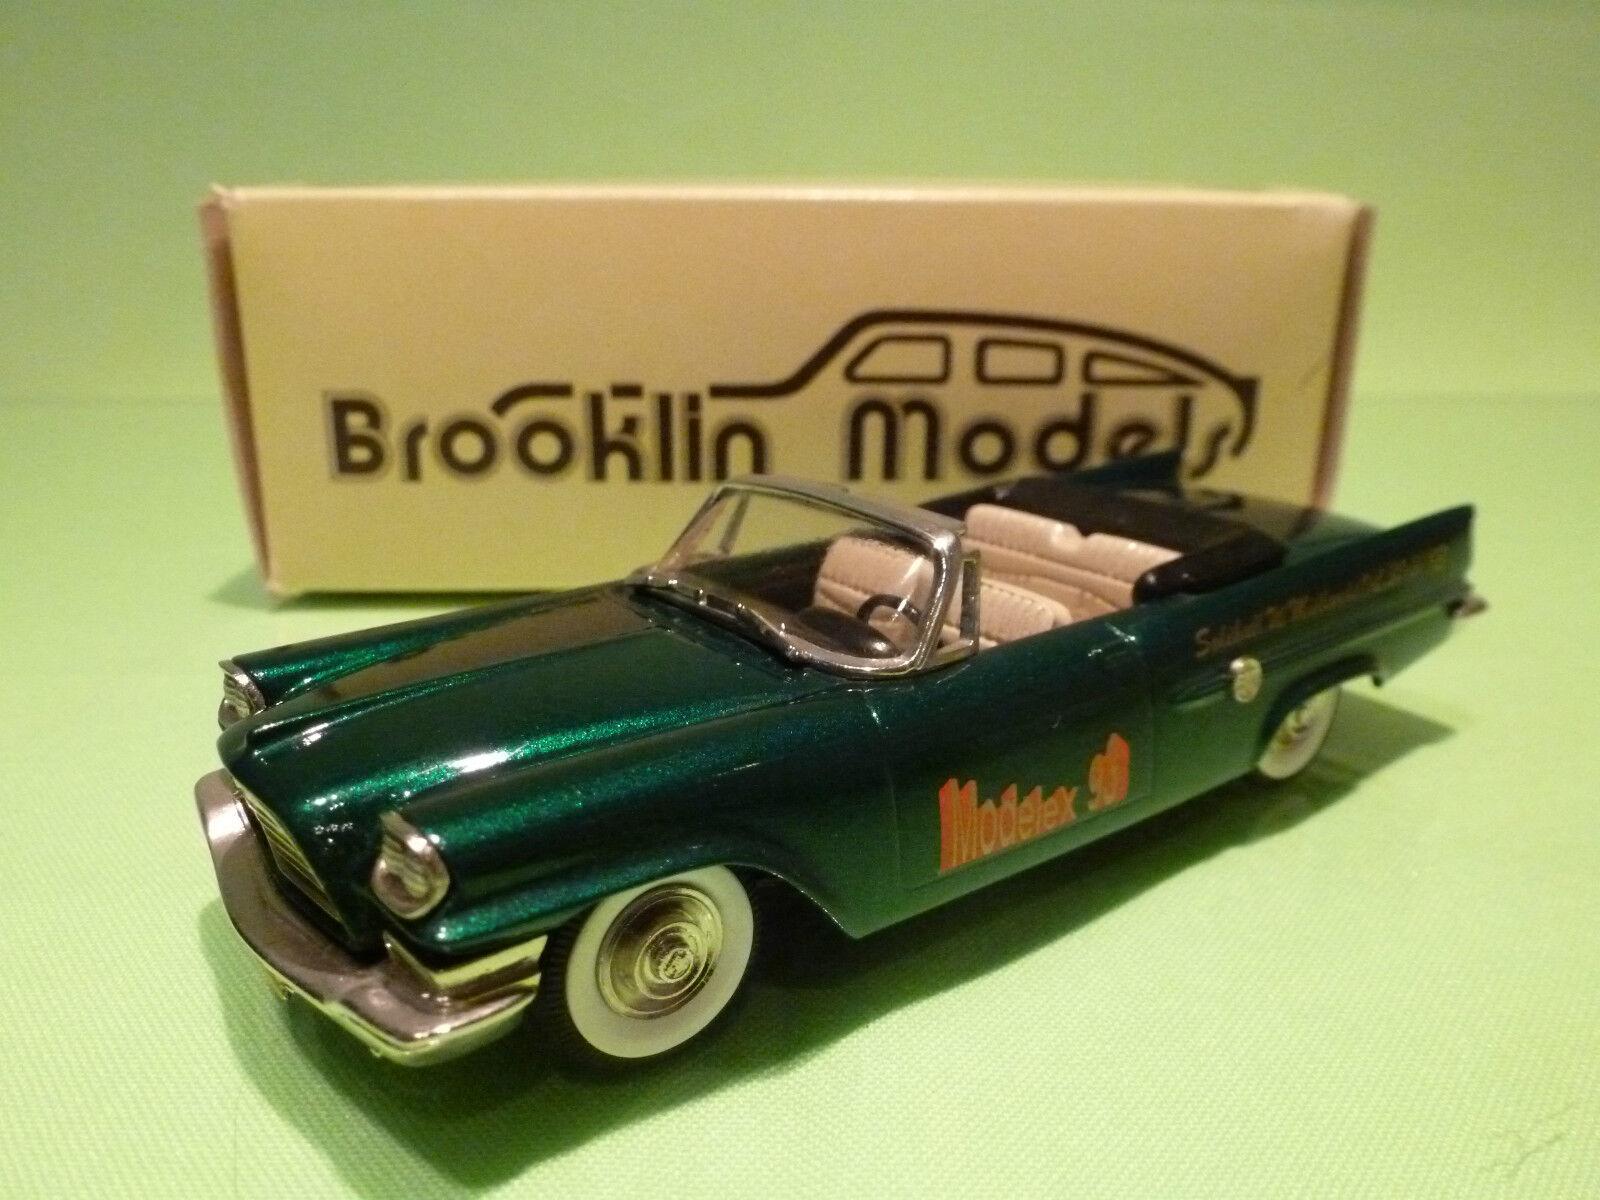 BROOKLIN MODELS 41x CHRYSLER 300E COverdeIBLE 1959 -MODELEX 93- 1 43 - RARE NMIB